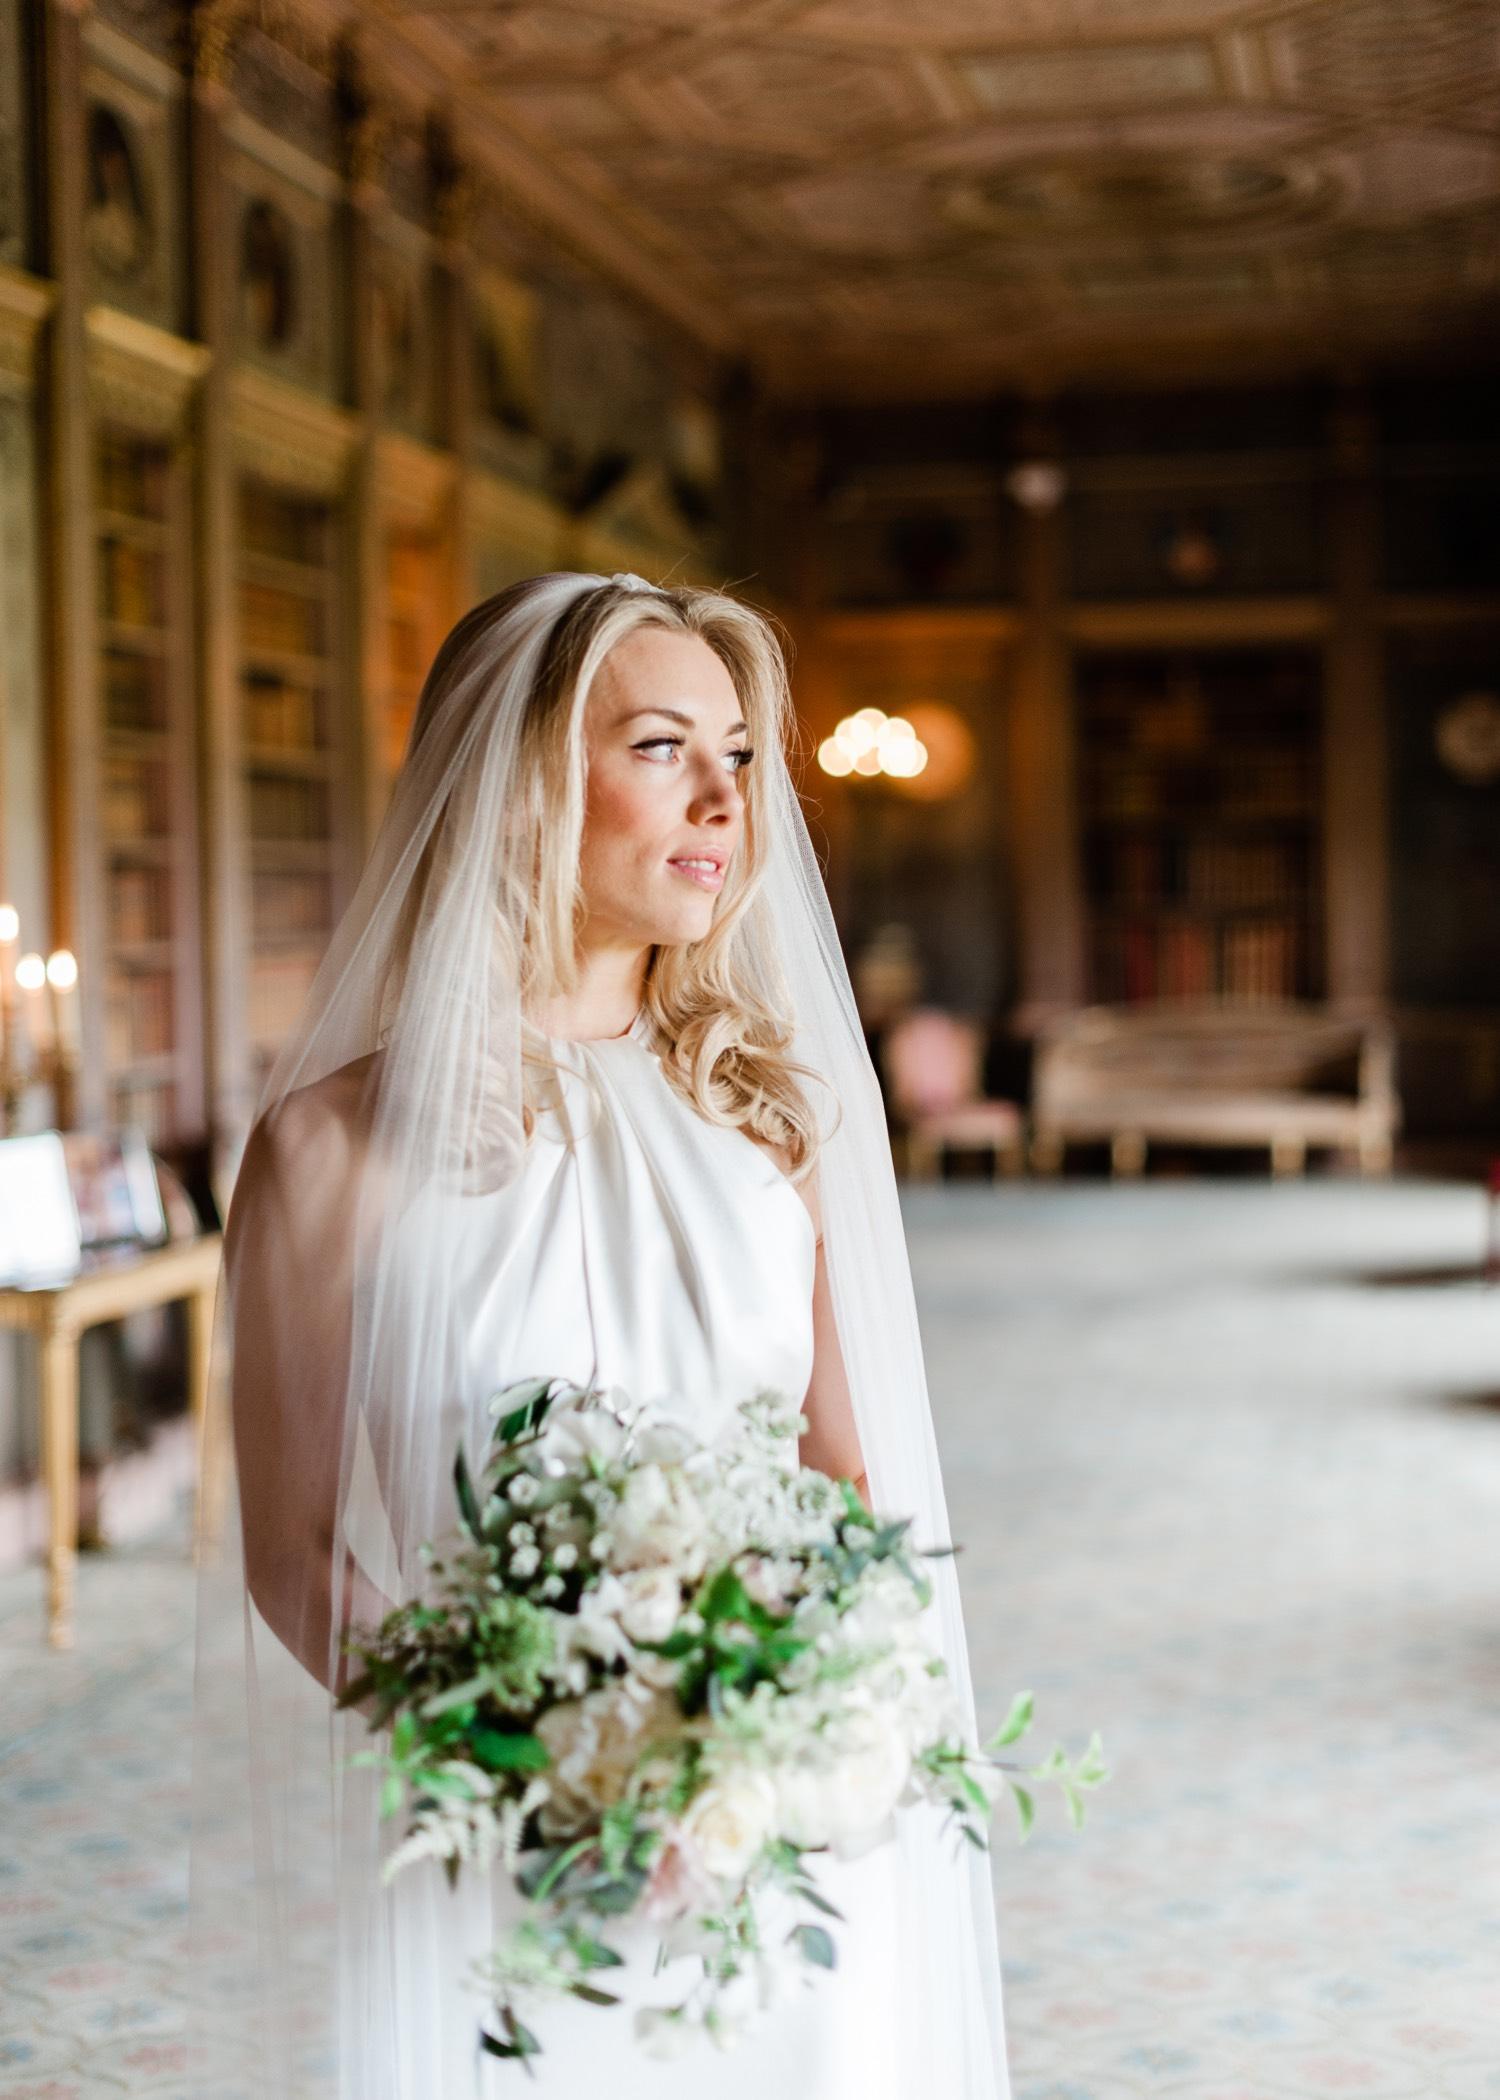 Littleton-Rose-Syon-House-London-Wedding-Planner-Stylish-Bride.jpg